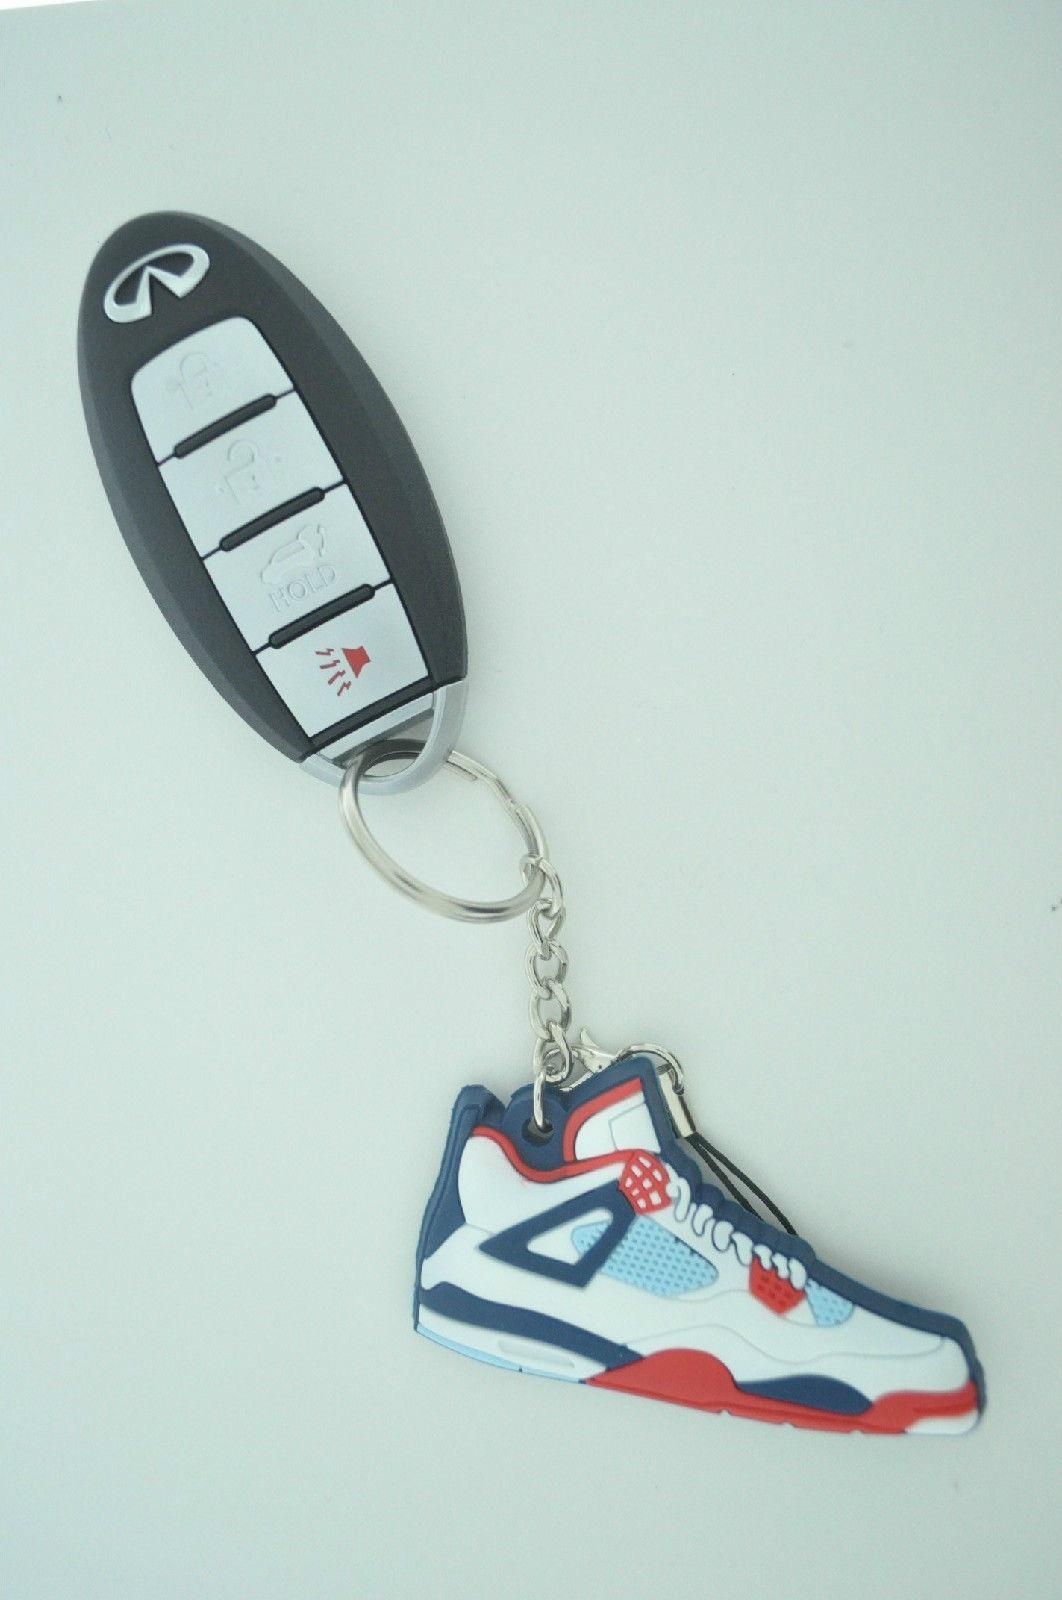 cheap for discount 577a3 802f4 ... Nike Air Jordan Retro 22 piece keychain lot, Air Yeezy, BUY 2 GET 1 ...